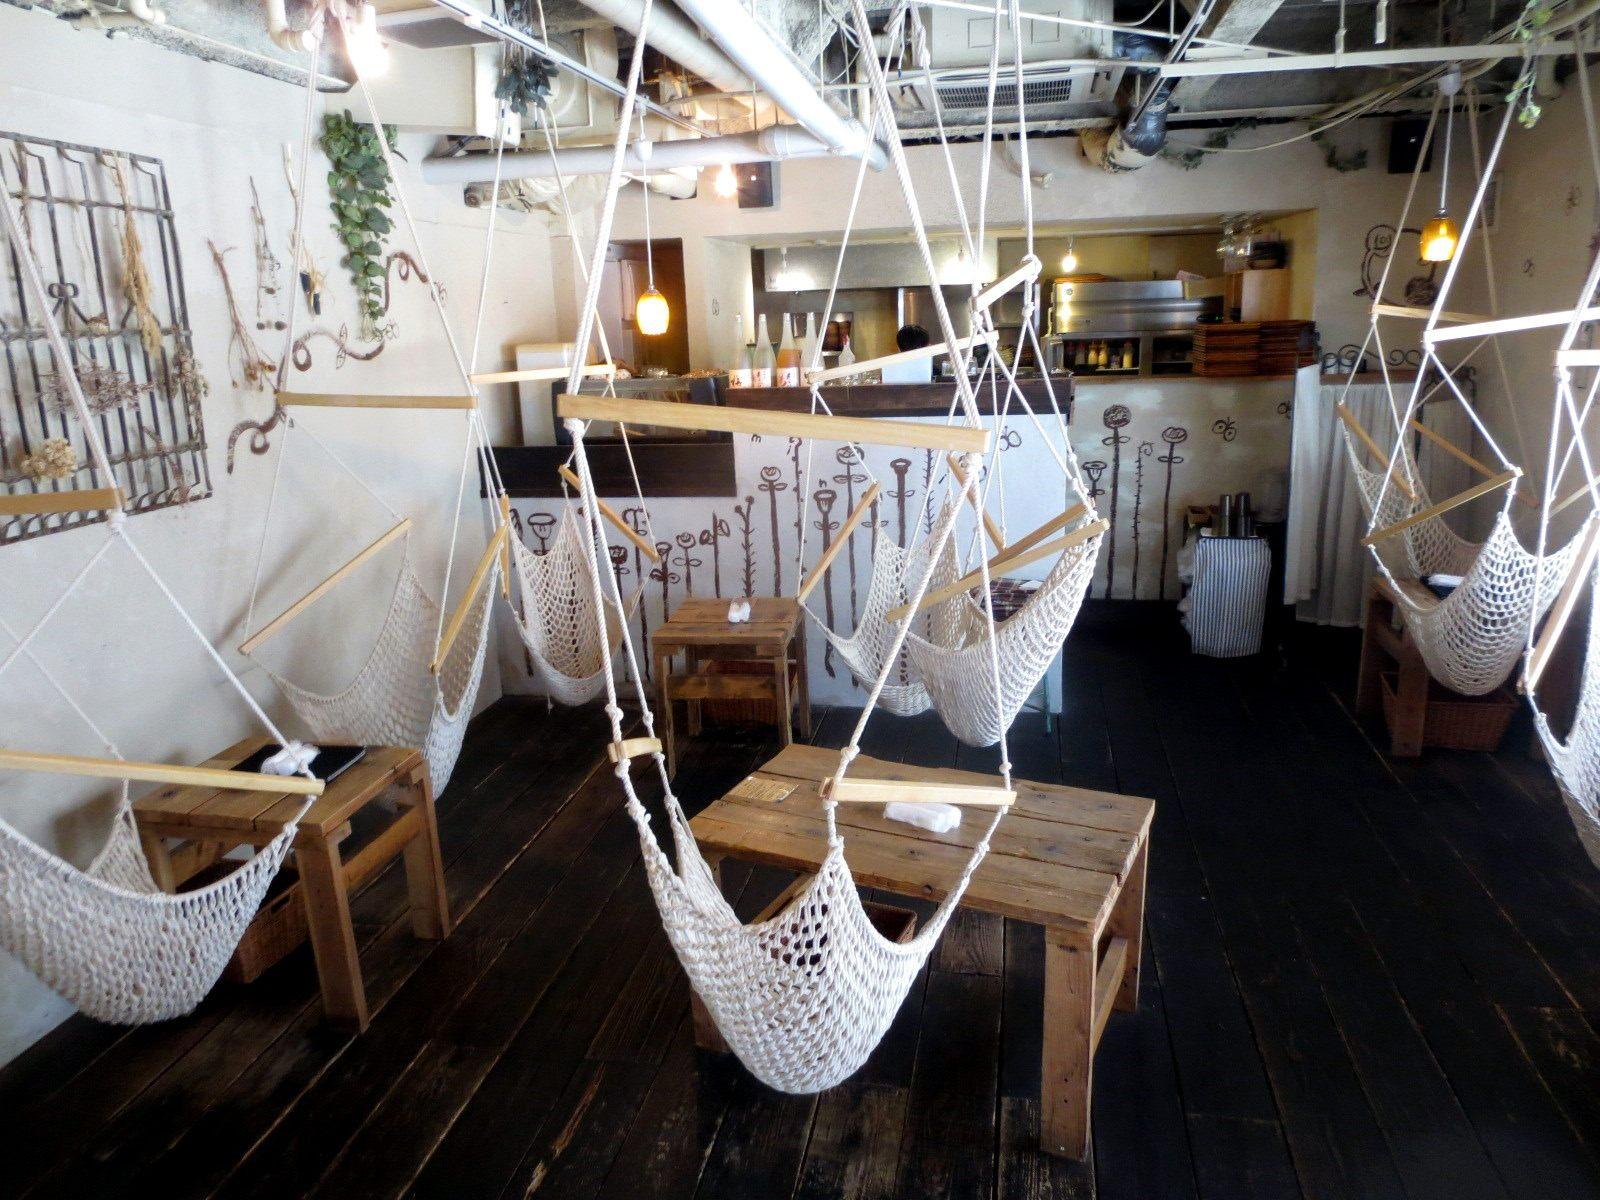 The 1st floor has hammock seats!